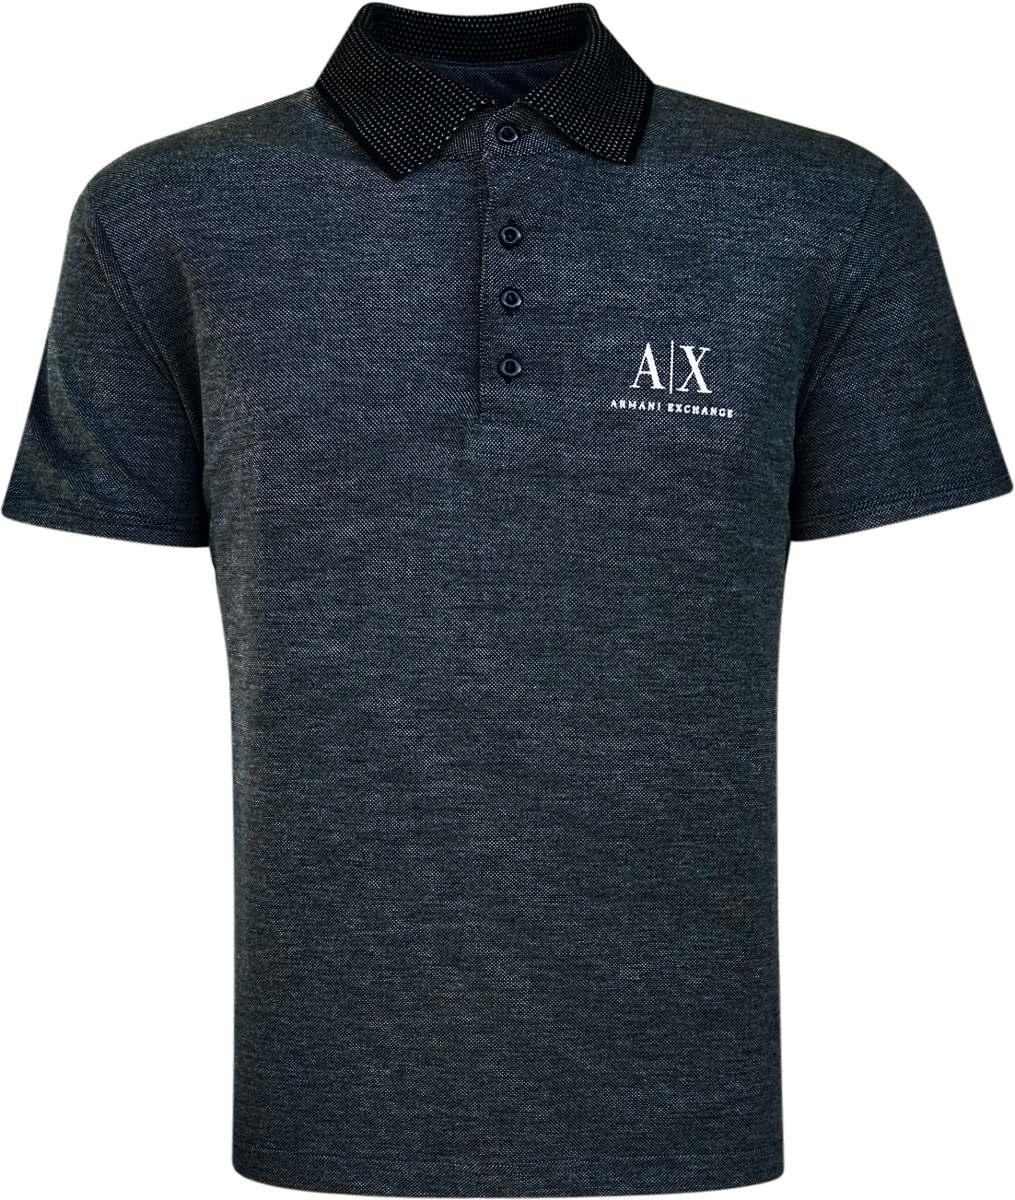 camisa polo armani exchange masculina preta pronta entrega. Carregando zoom. 07be171c82f0a